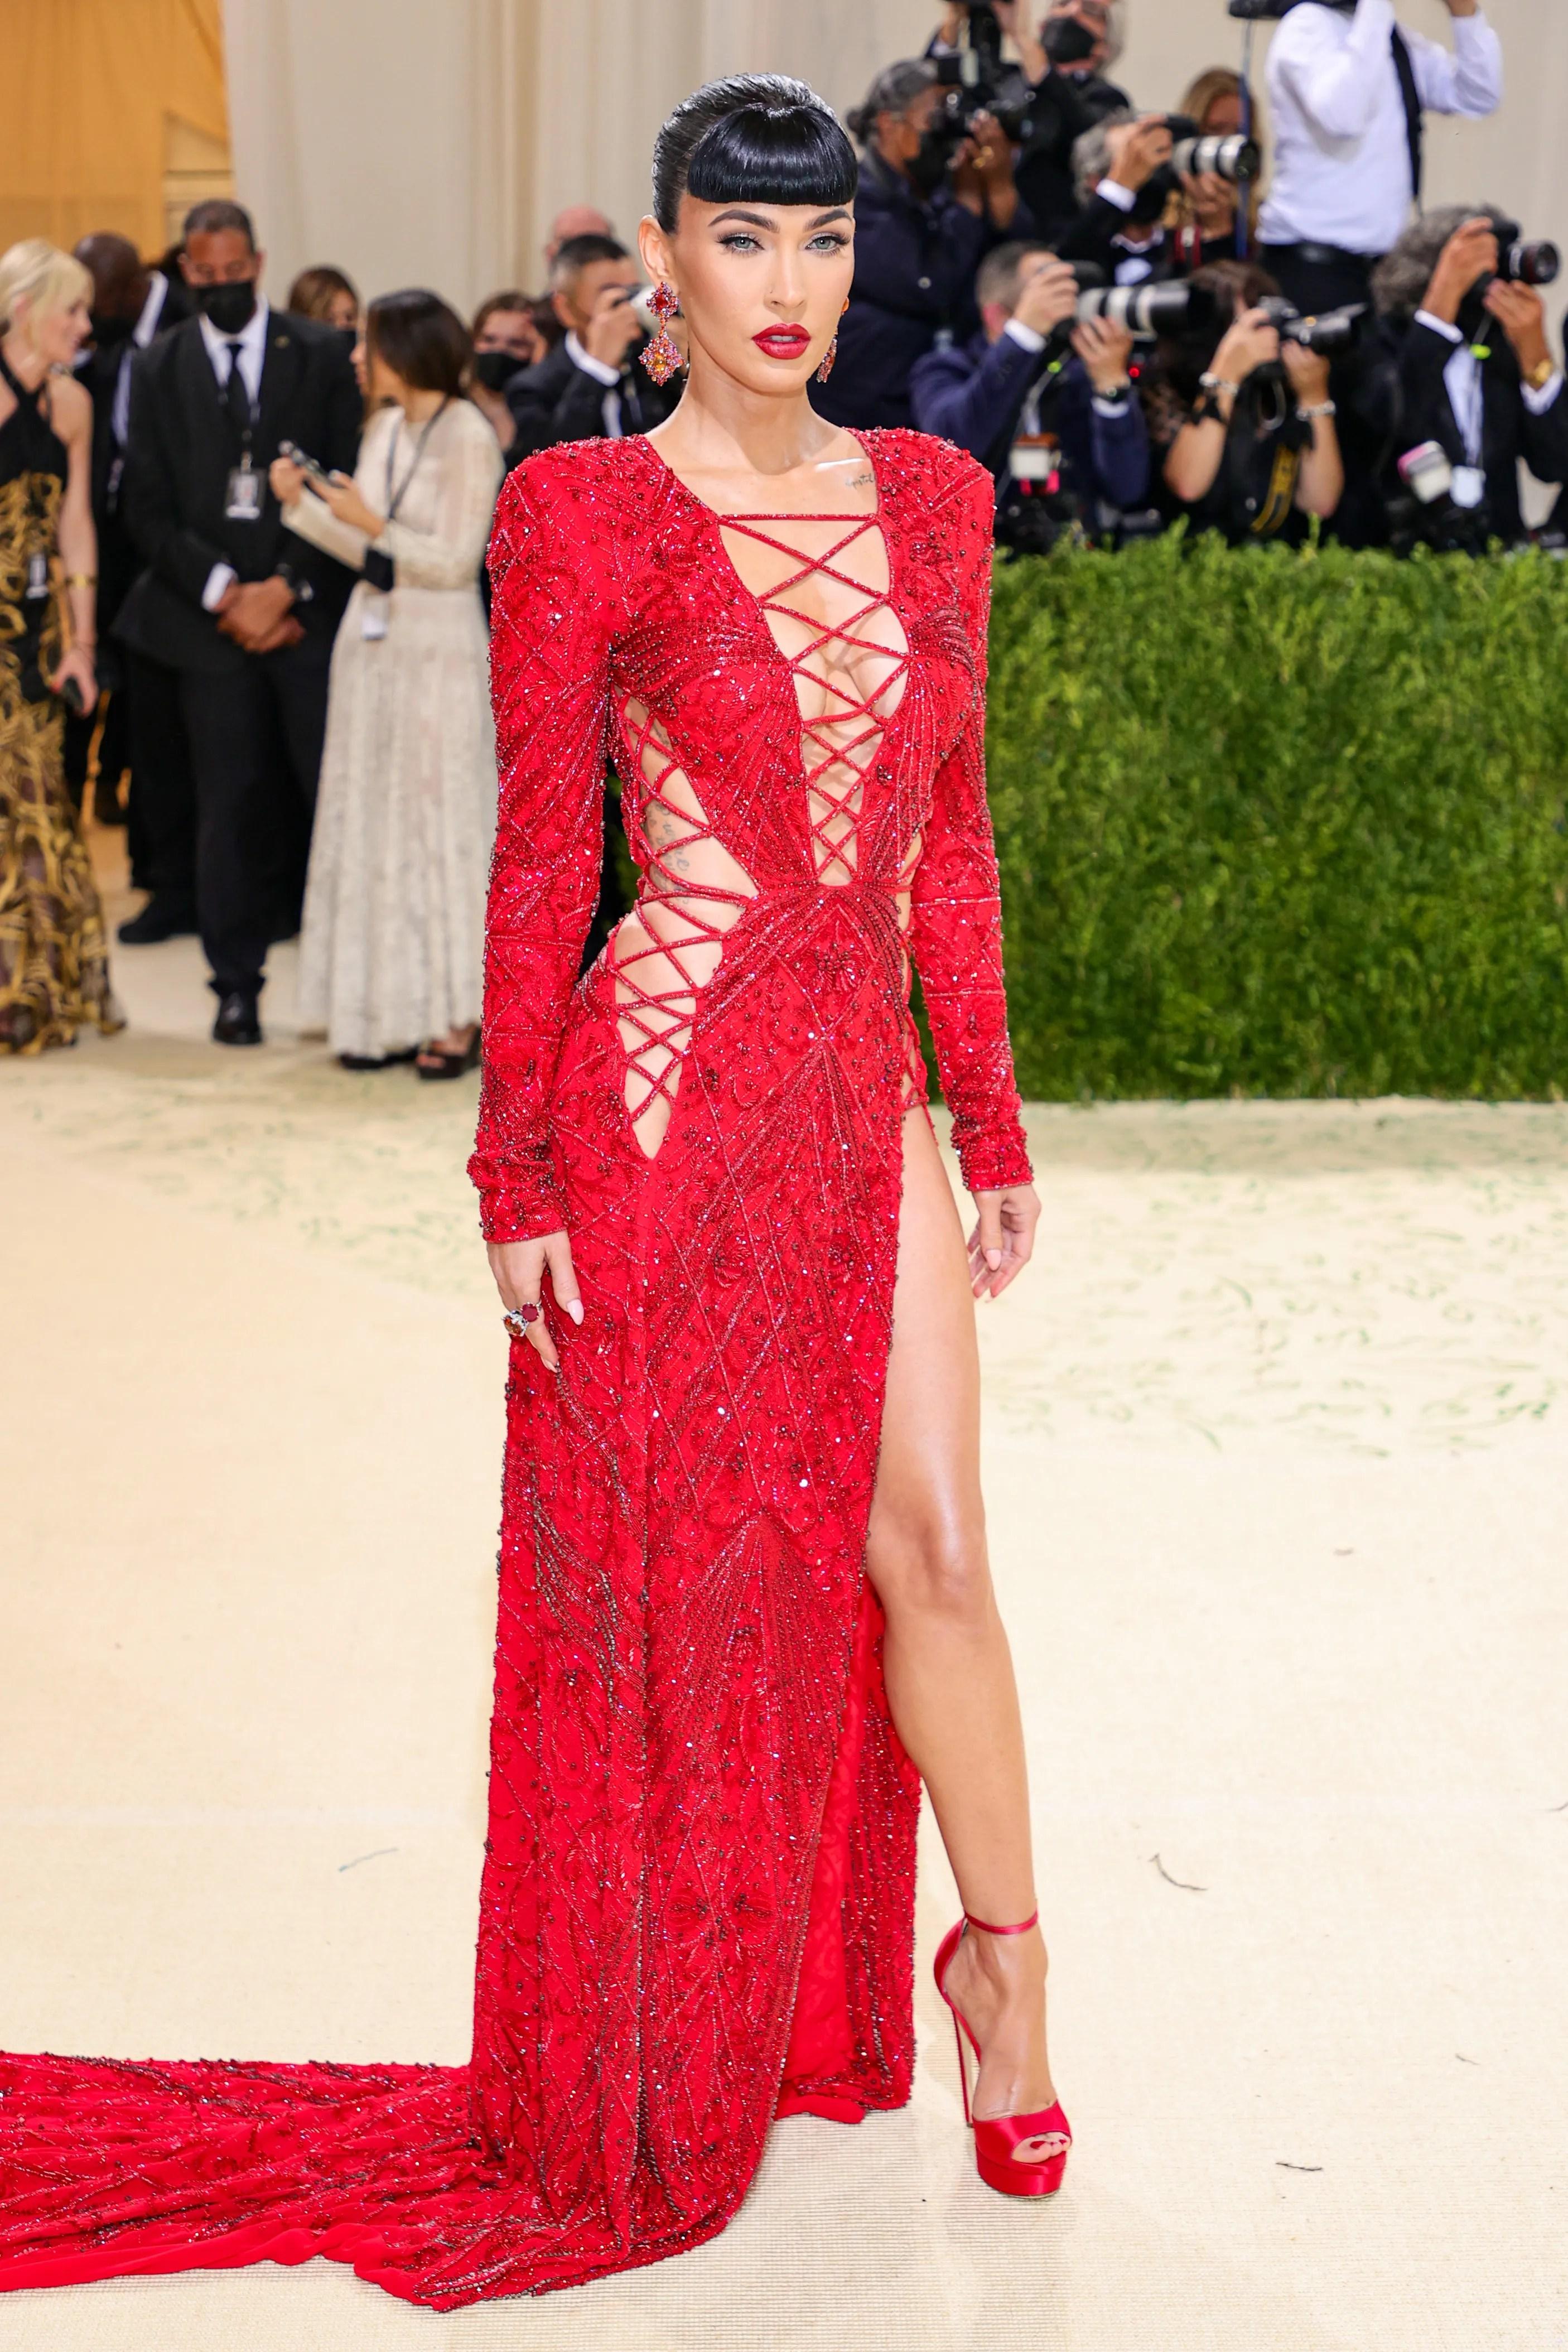 d7bc6646 082c 4fdc a74f 439fea34215b GTY 1340138575 Met Gala 2021: Megan Fox, Rihanna, Kim Kardashian, AOC, more wild red-carpet looks